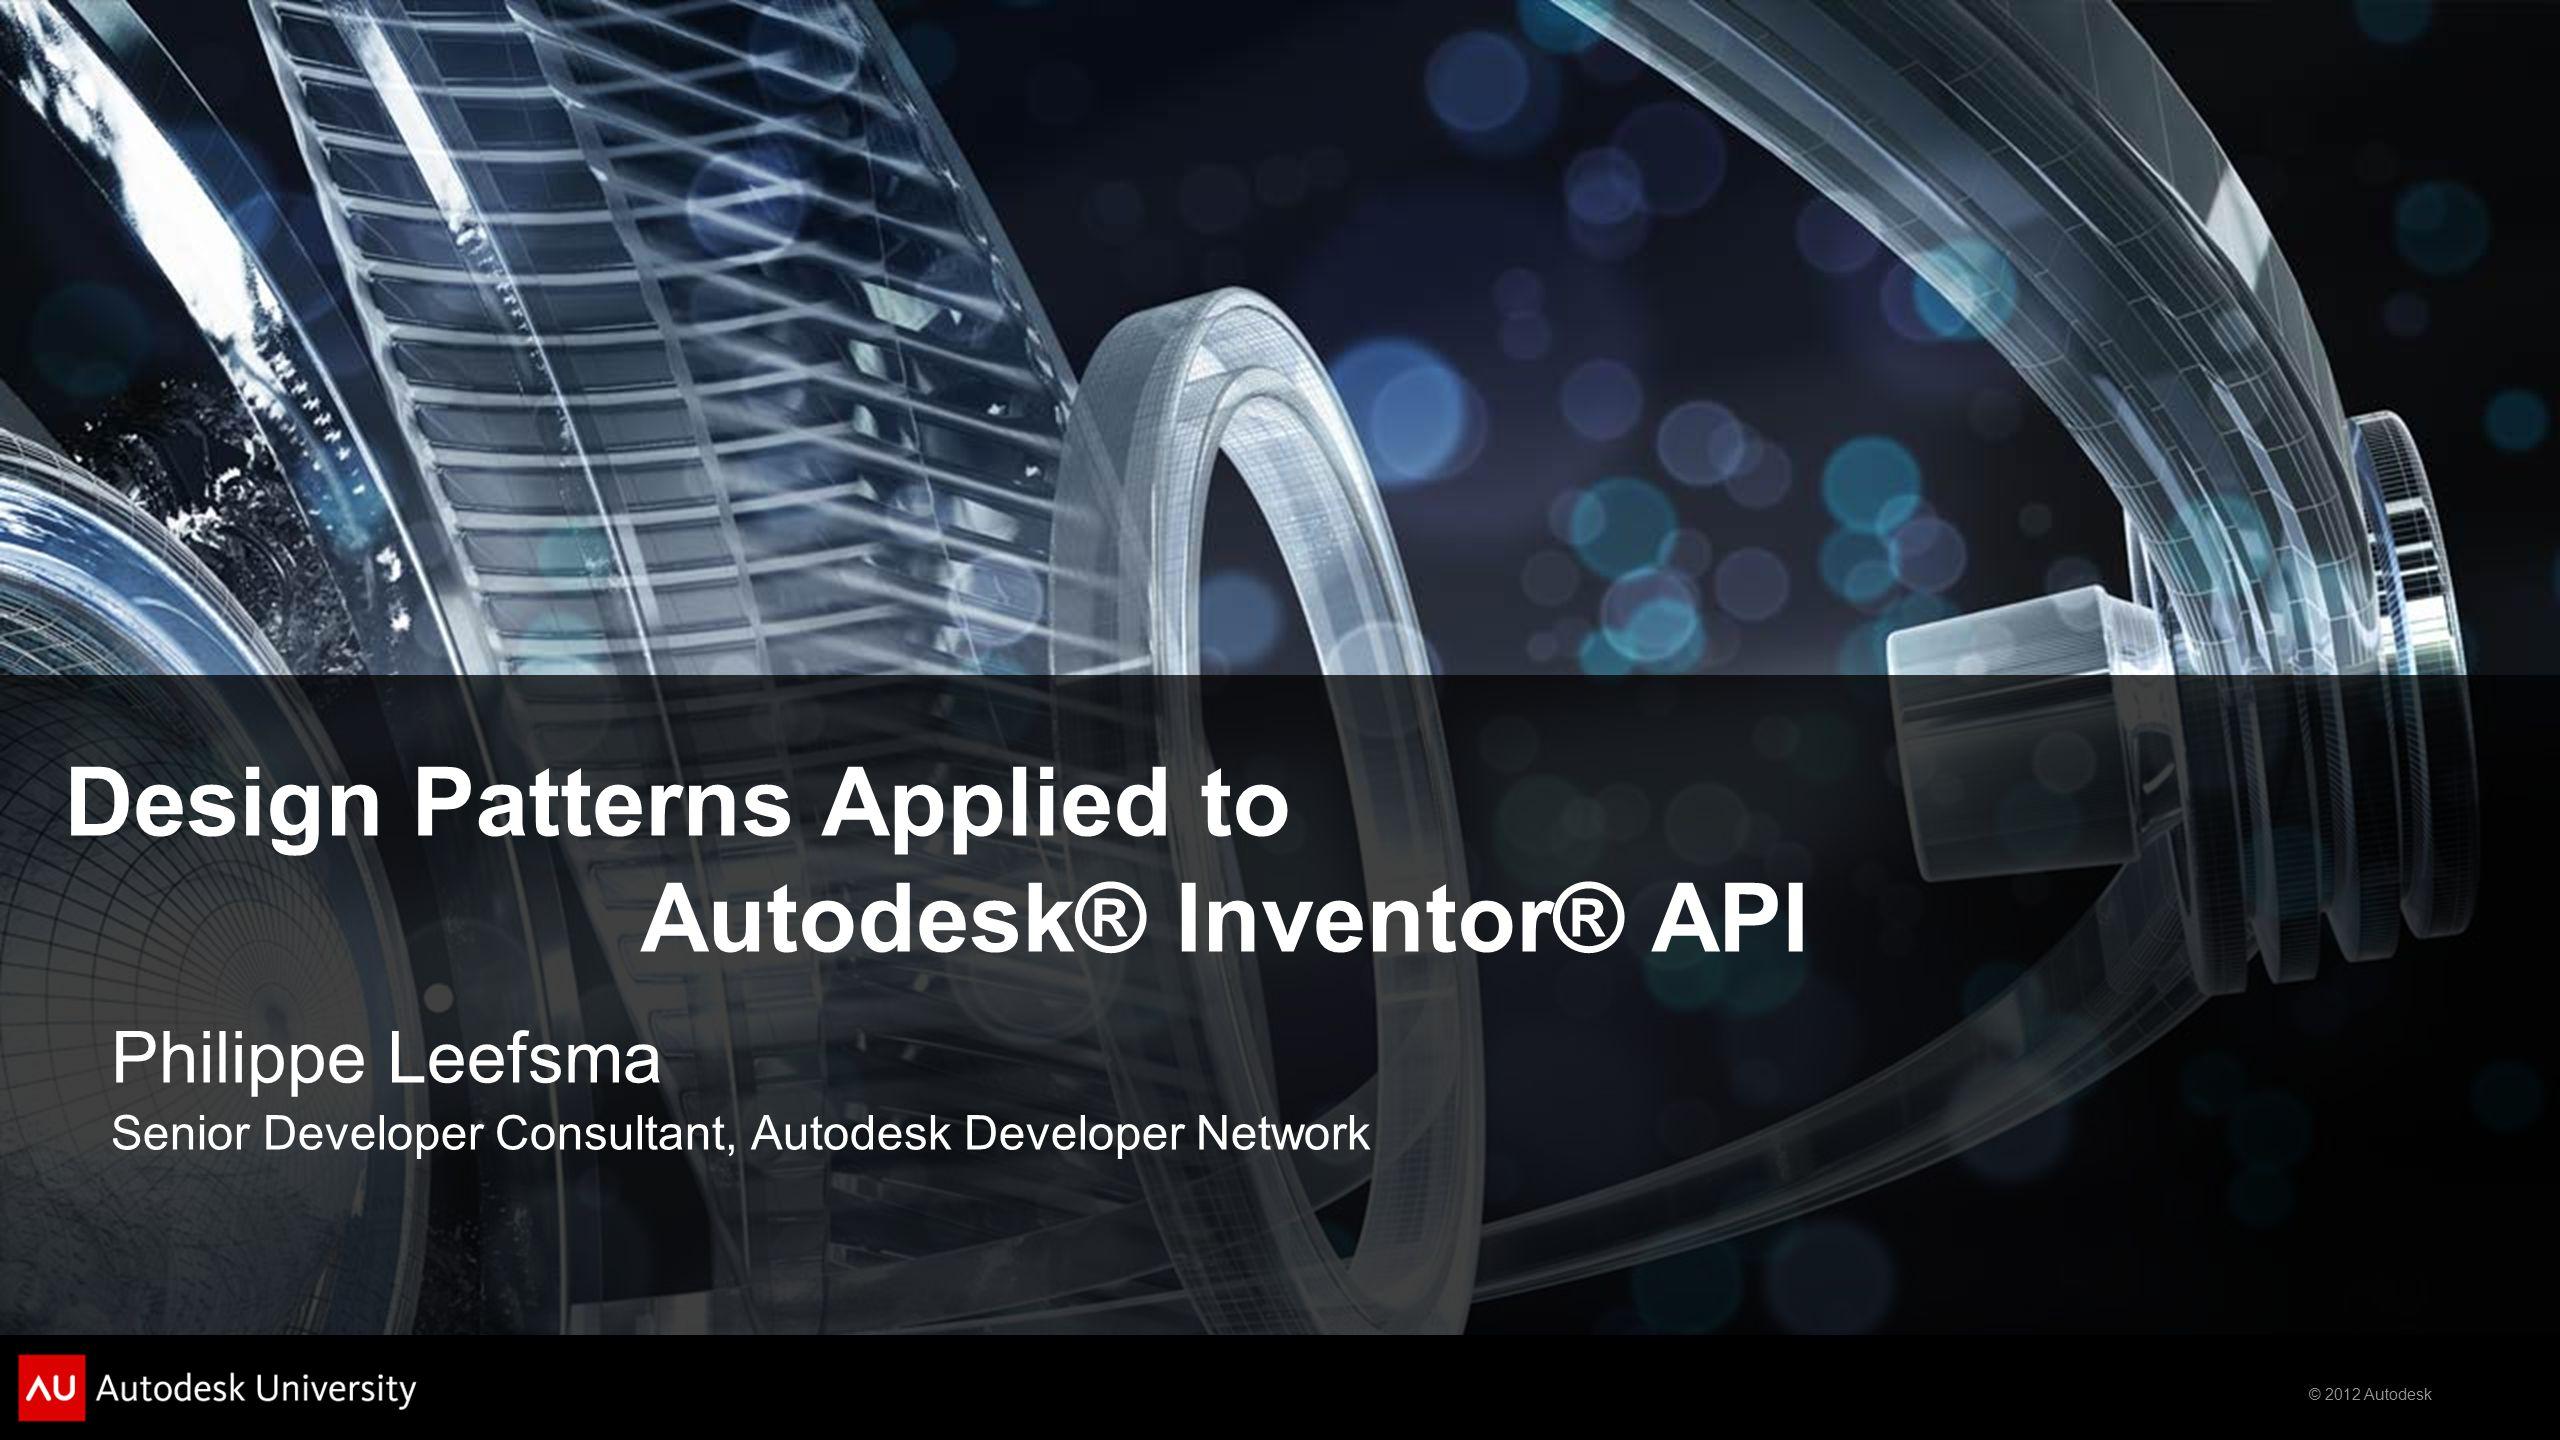 © 2012 Autodesk Design Patterns Applied to Autodesk® Inventor® API Philippe Leefsma Senior Developer Consultant, Autodesk Developer Network